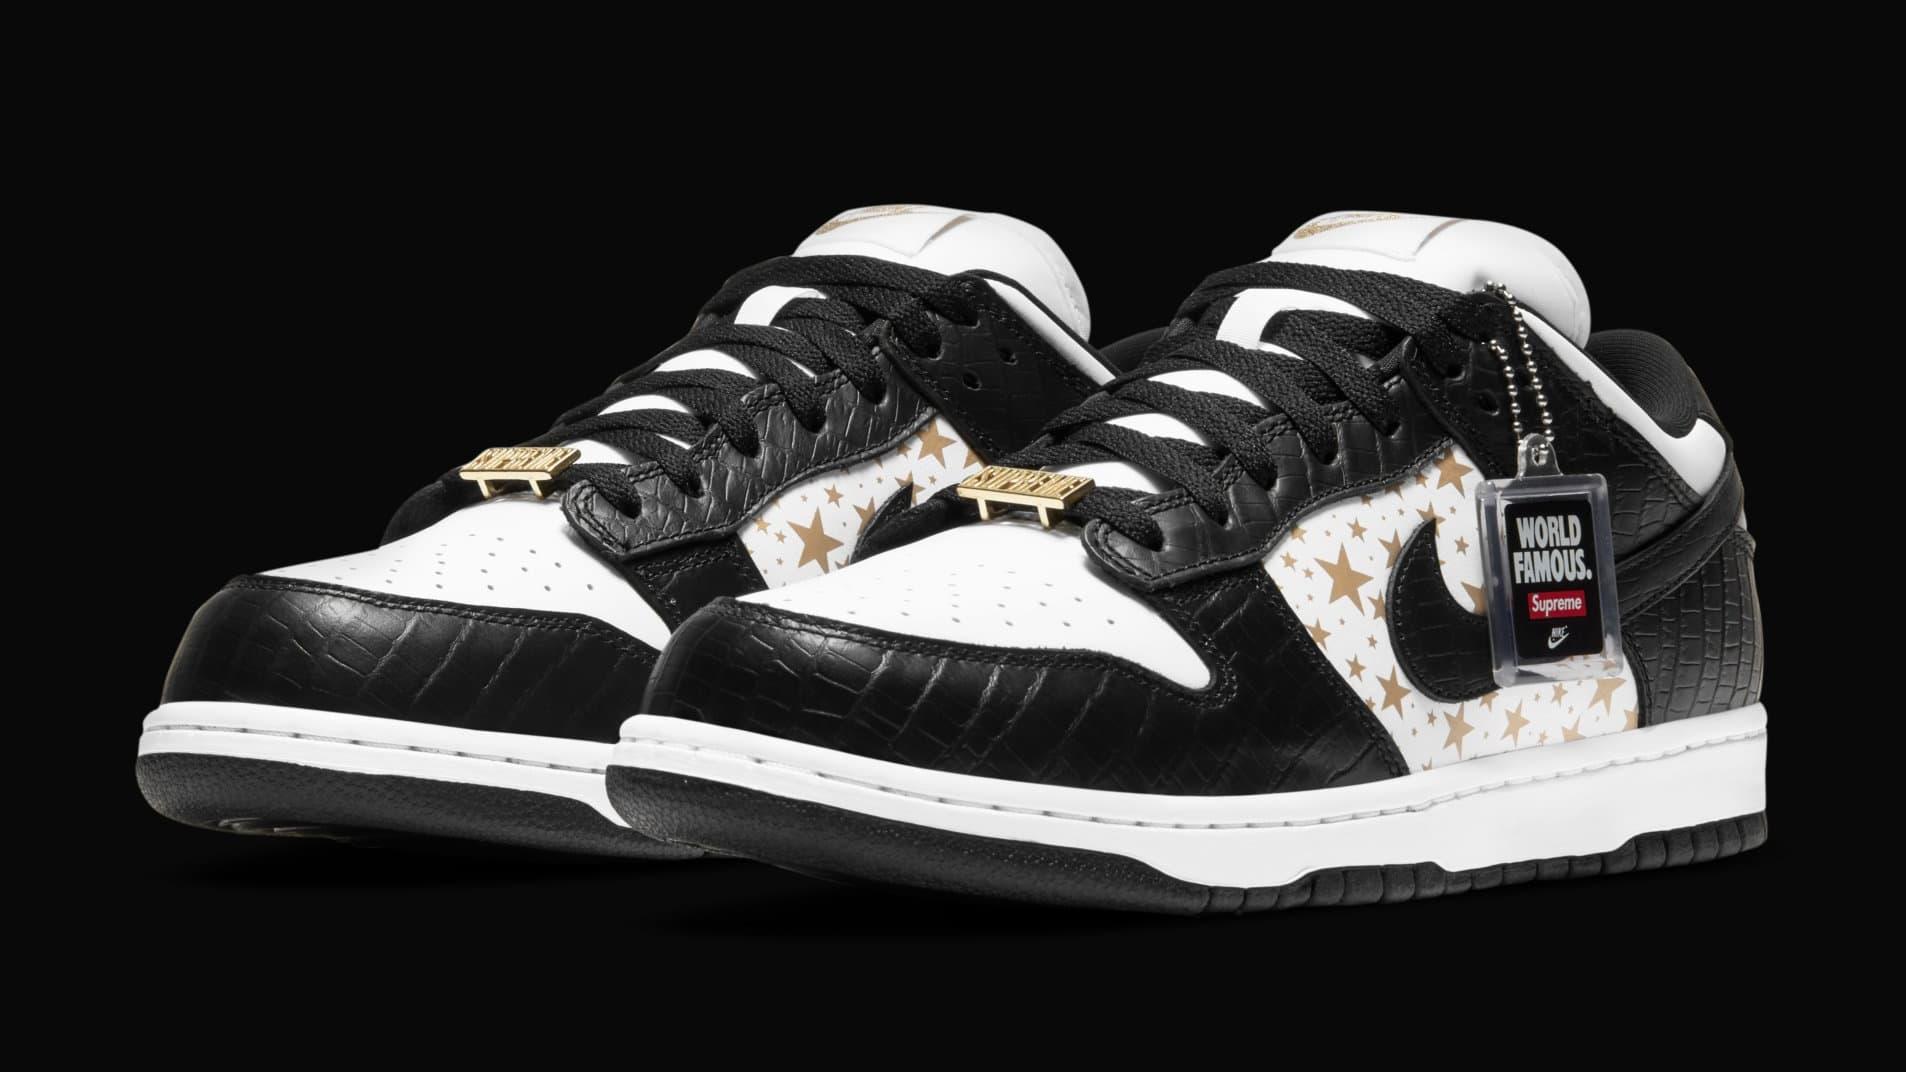 Supreme x Nike SB Dunk Low 'Black' DH3228-102 (Pair)